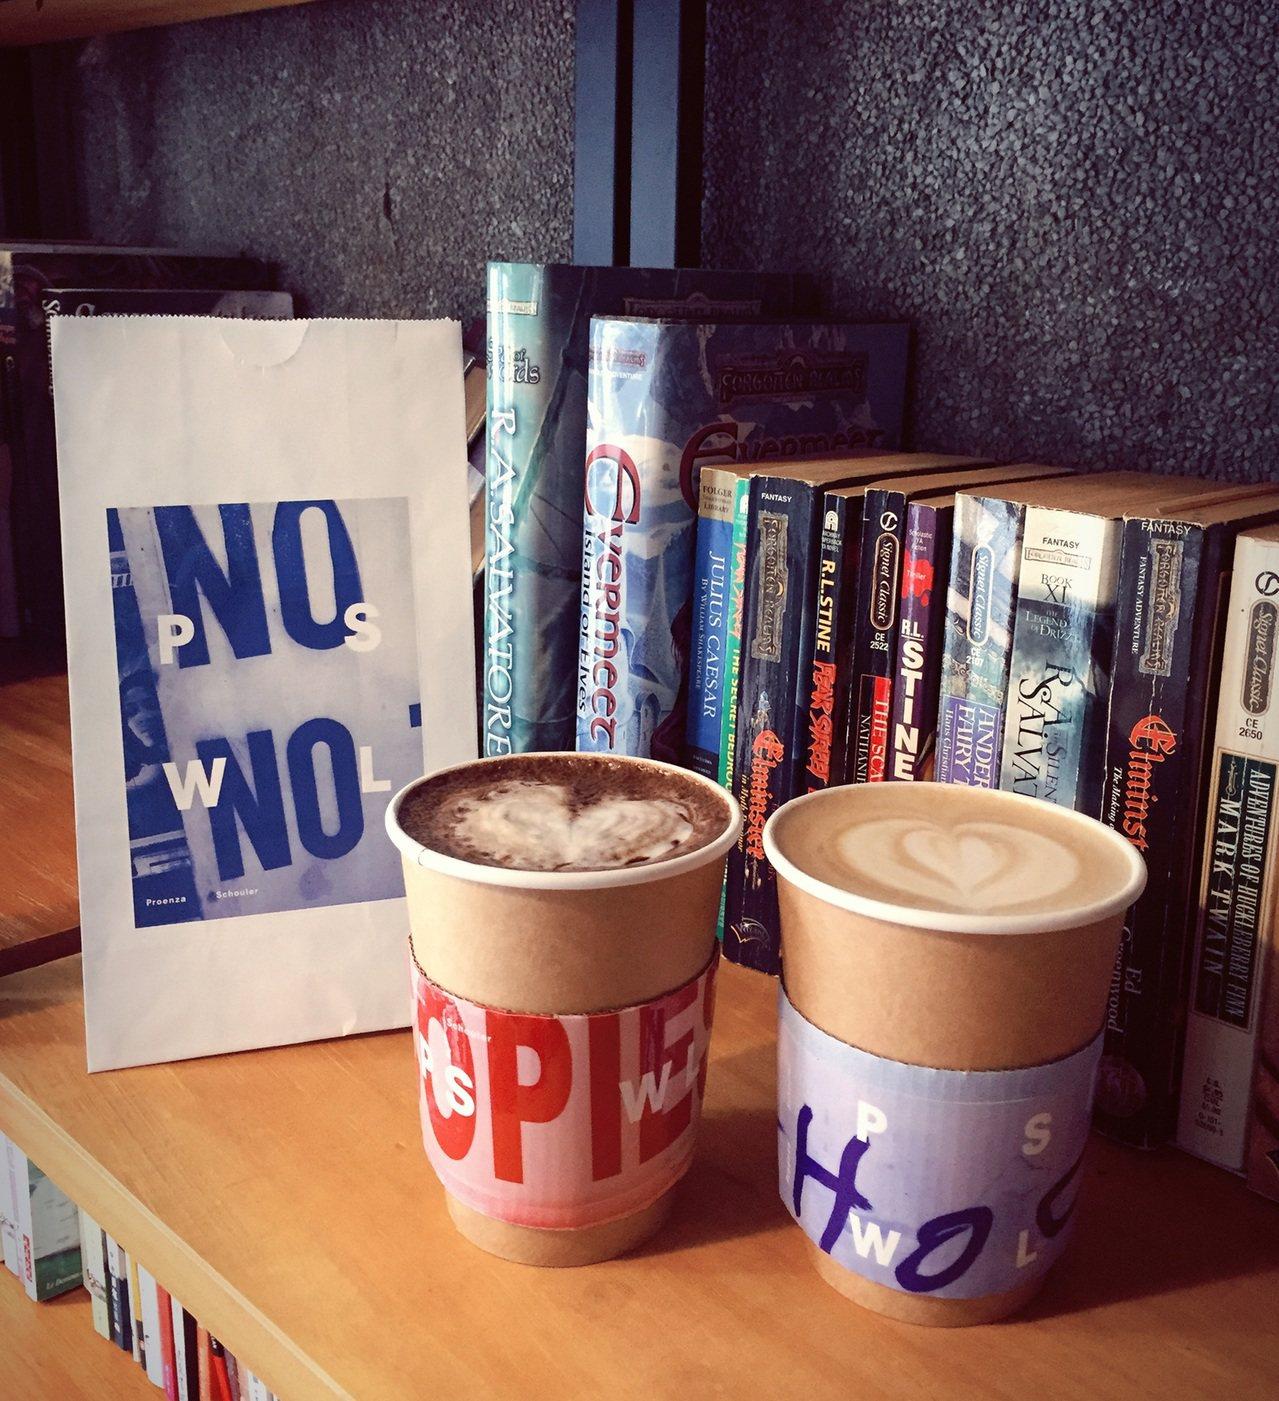 PSWL系列和好物Spirit咖啡推出限量咖啡外帶杯套及紙袋。圖/Proenza...